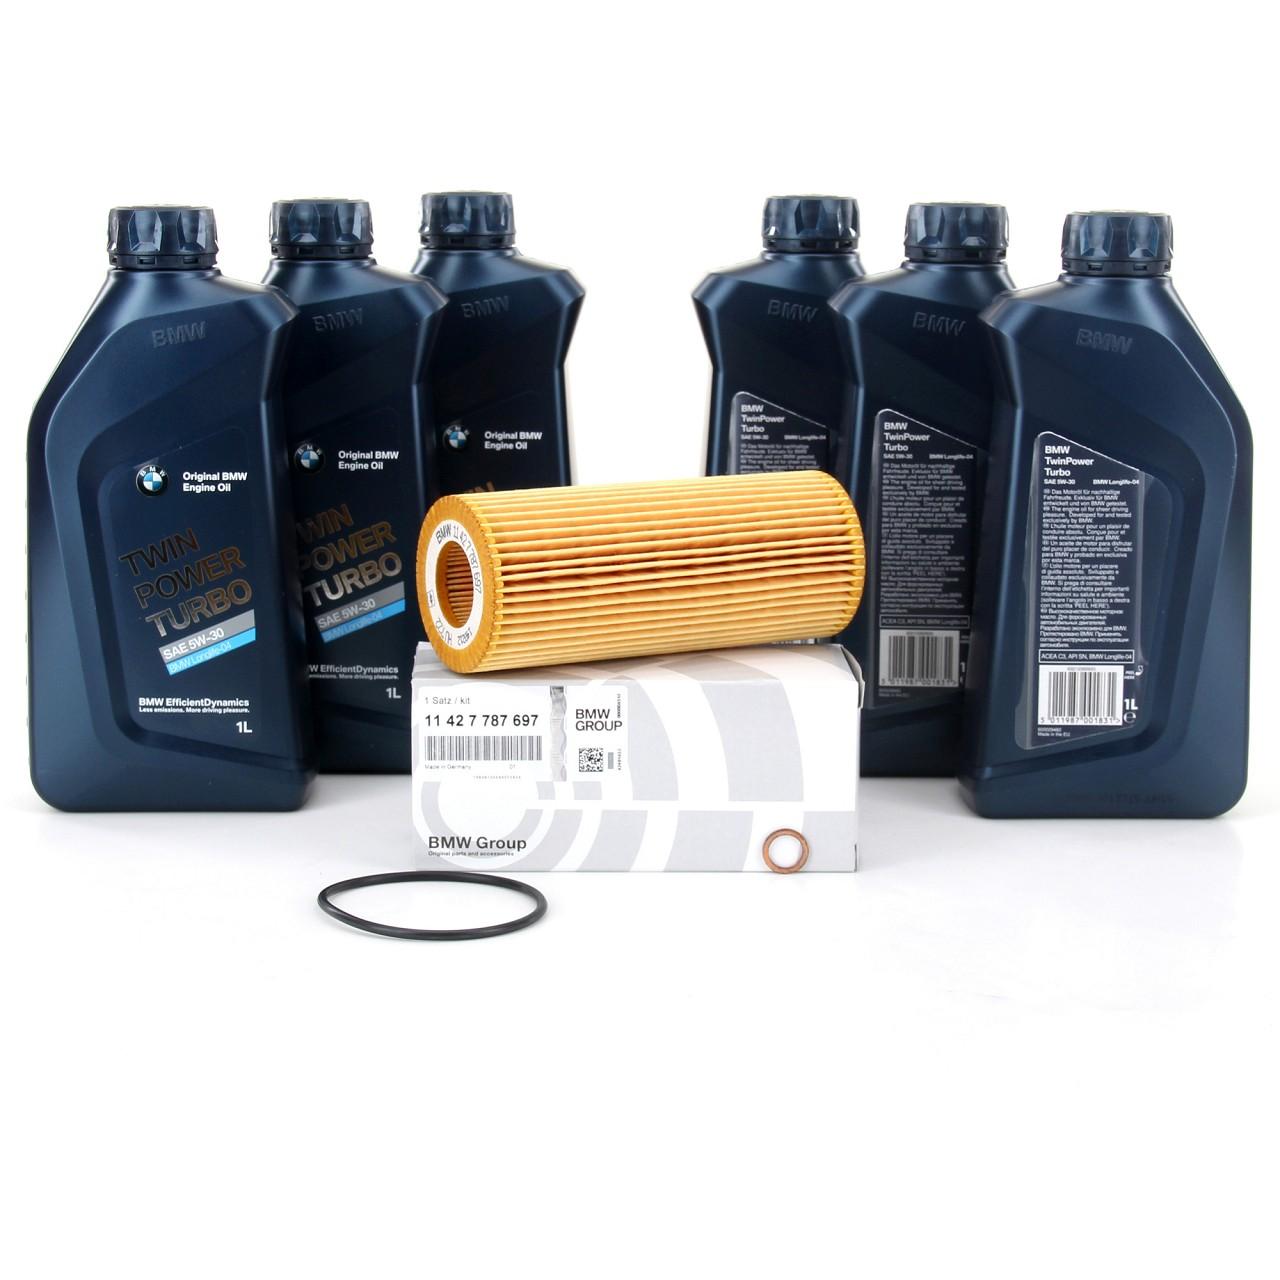 ORIGINAL BMW Motoröl Öl 5W30 LongLife-04 6 Liter + Ölfilter 11427787697